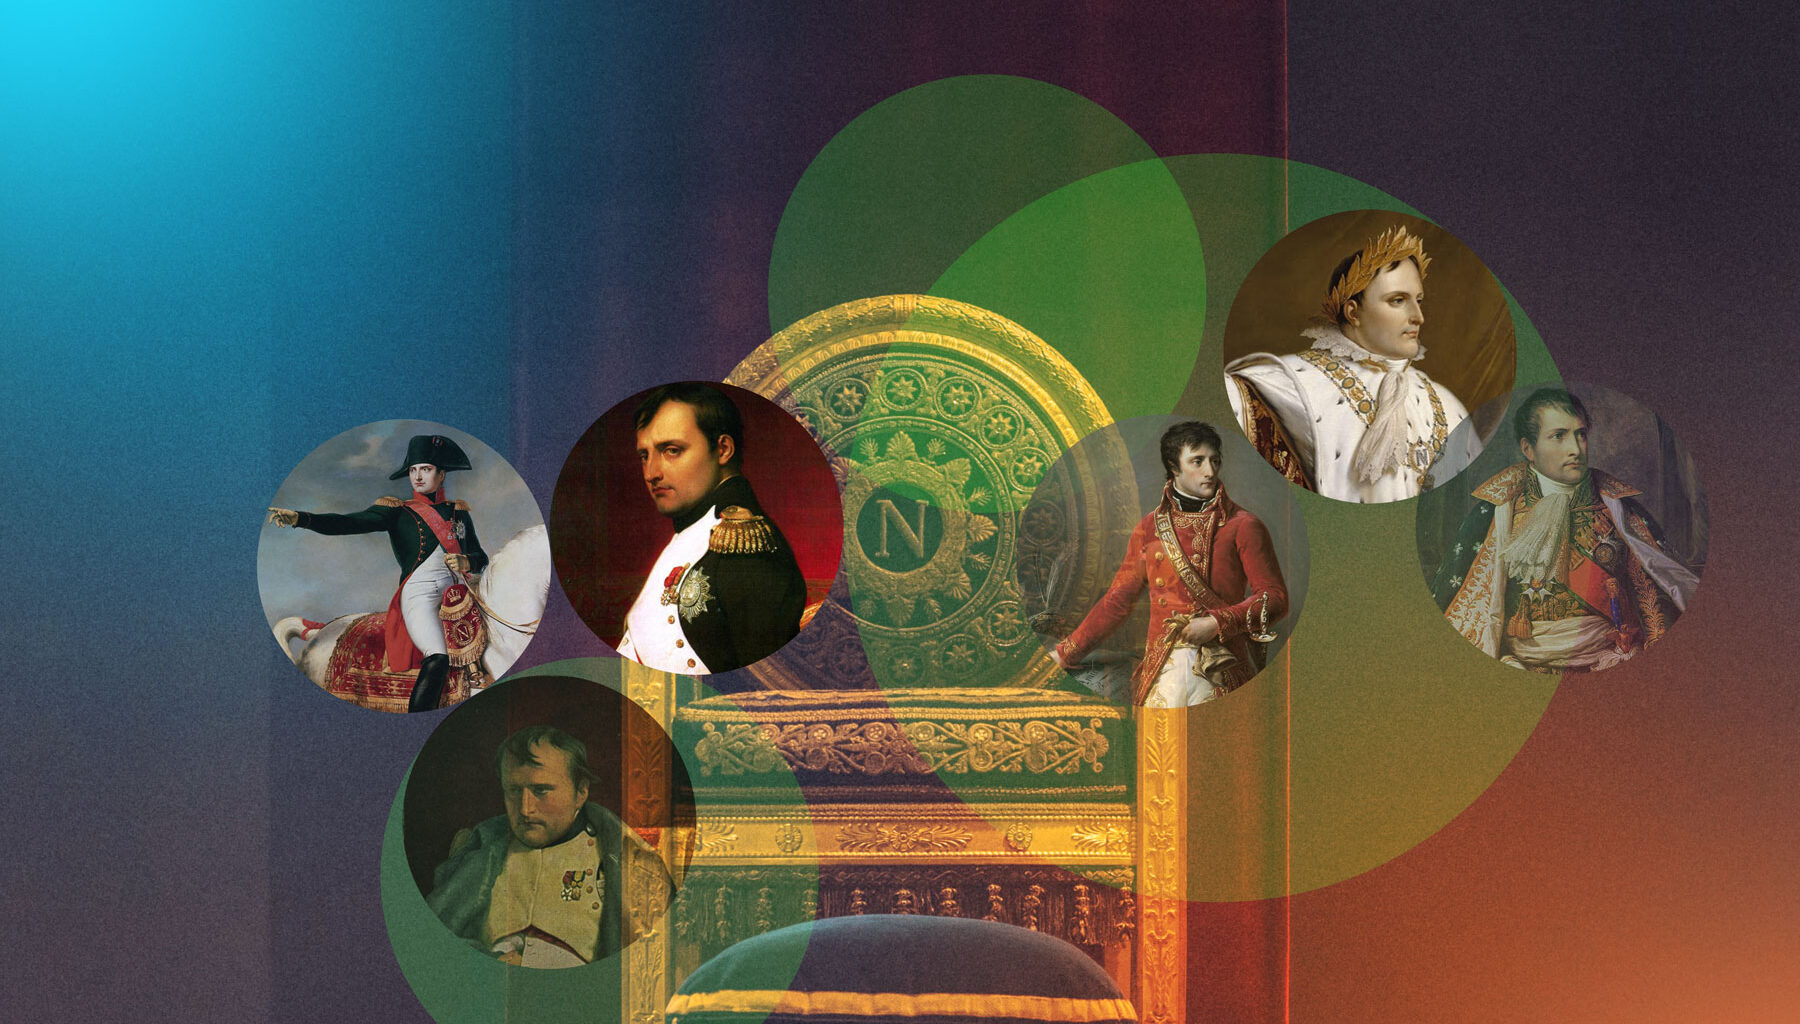 Die vielen Facetten Napoleons